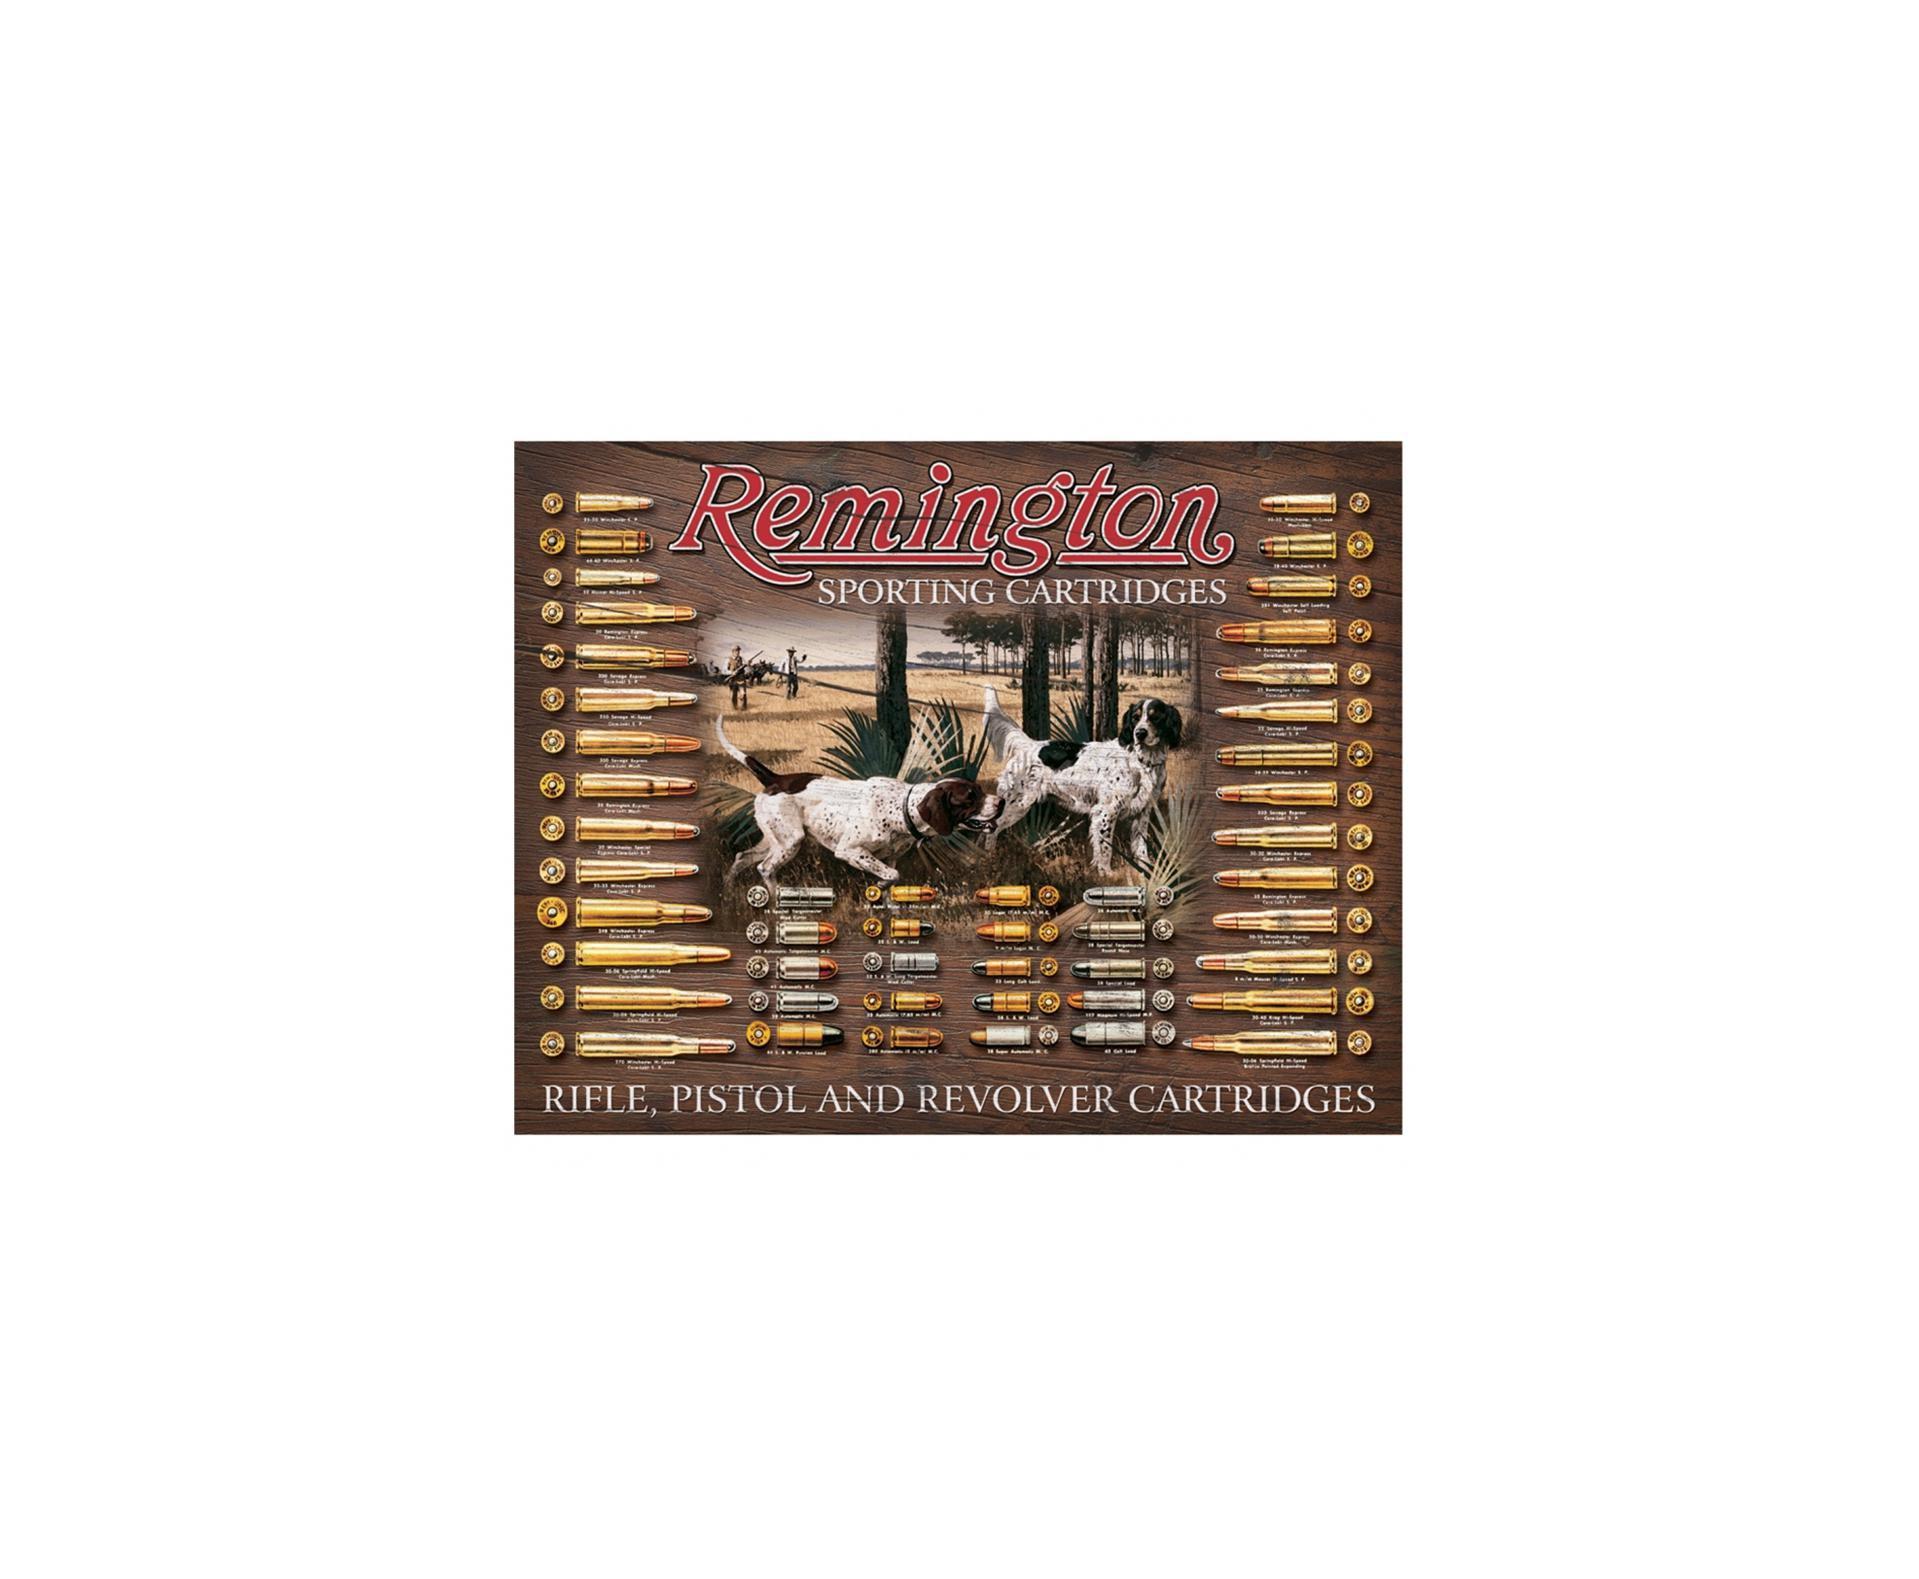 Placa Metálica Decorativa Remington Sporting -rossi